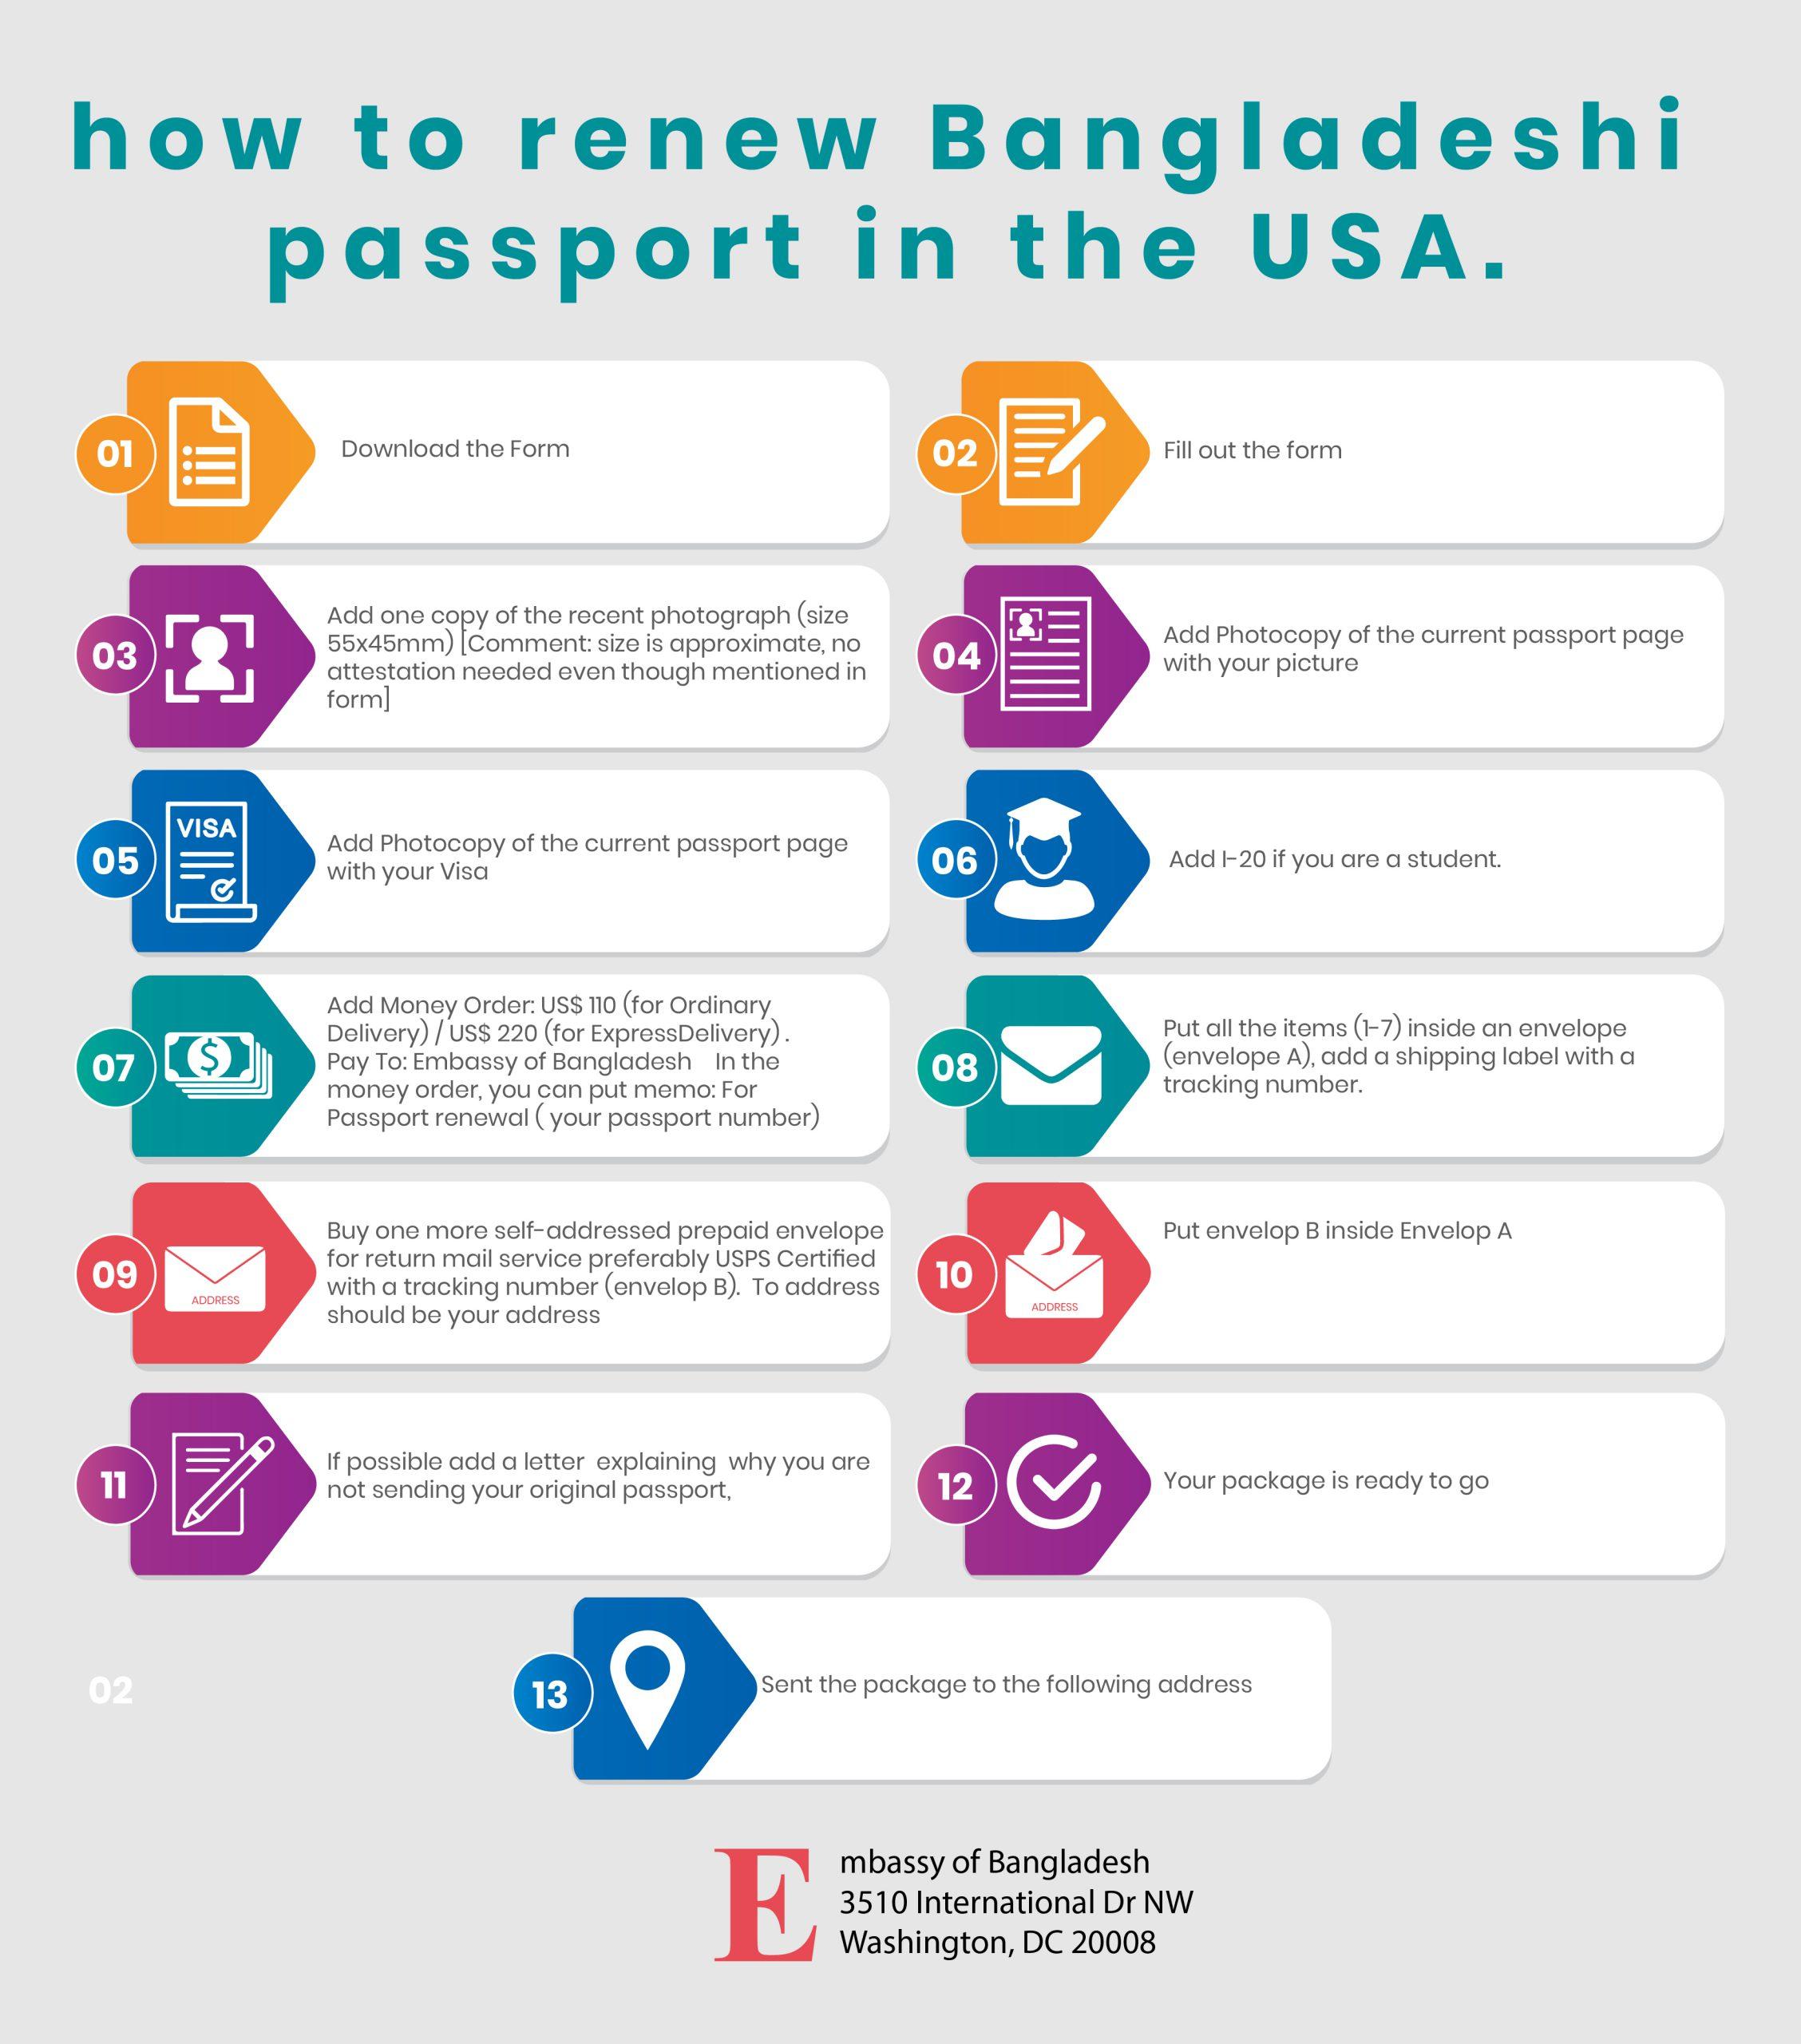 How To Renew Bangladeshi Passport In Usa